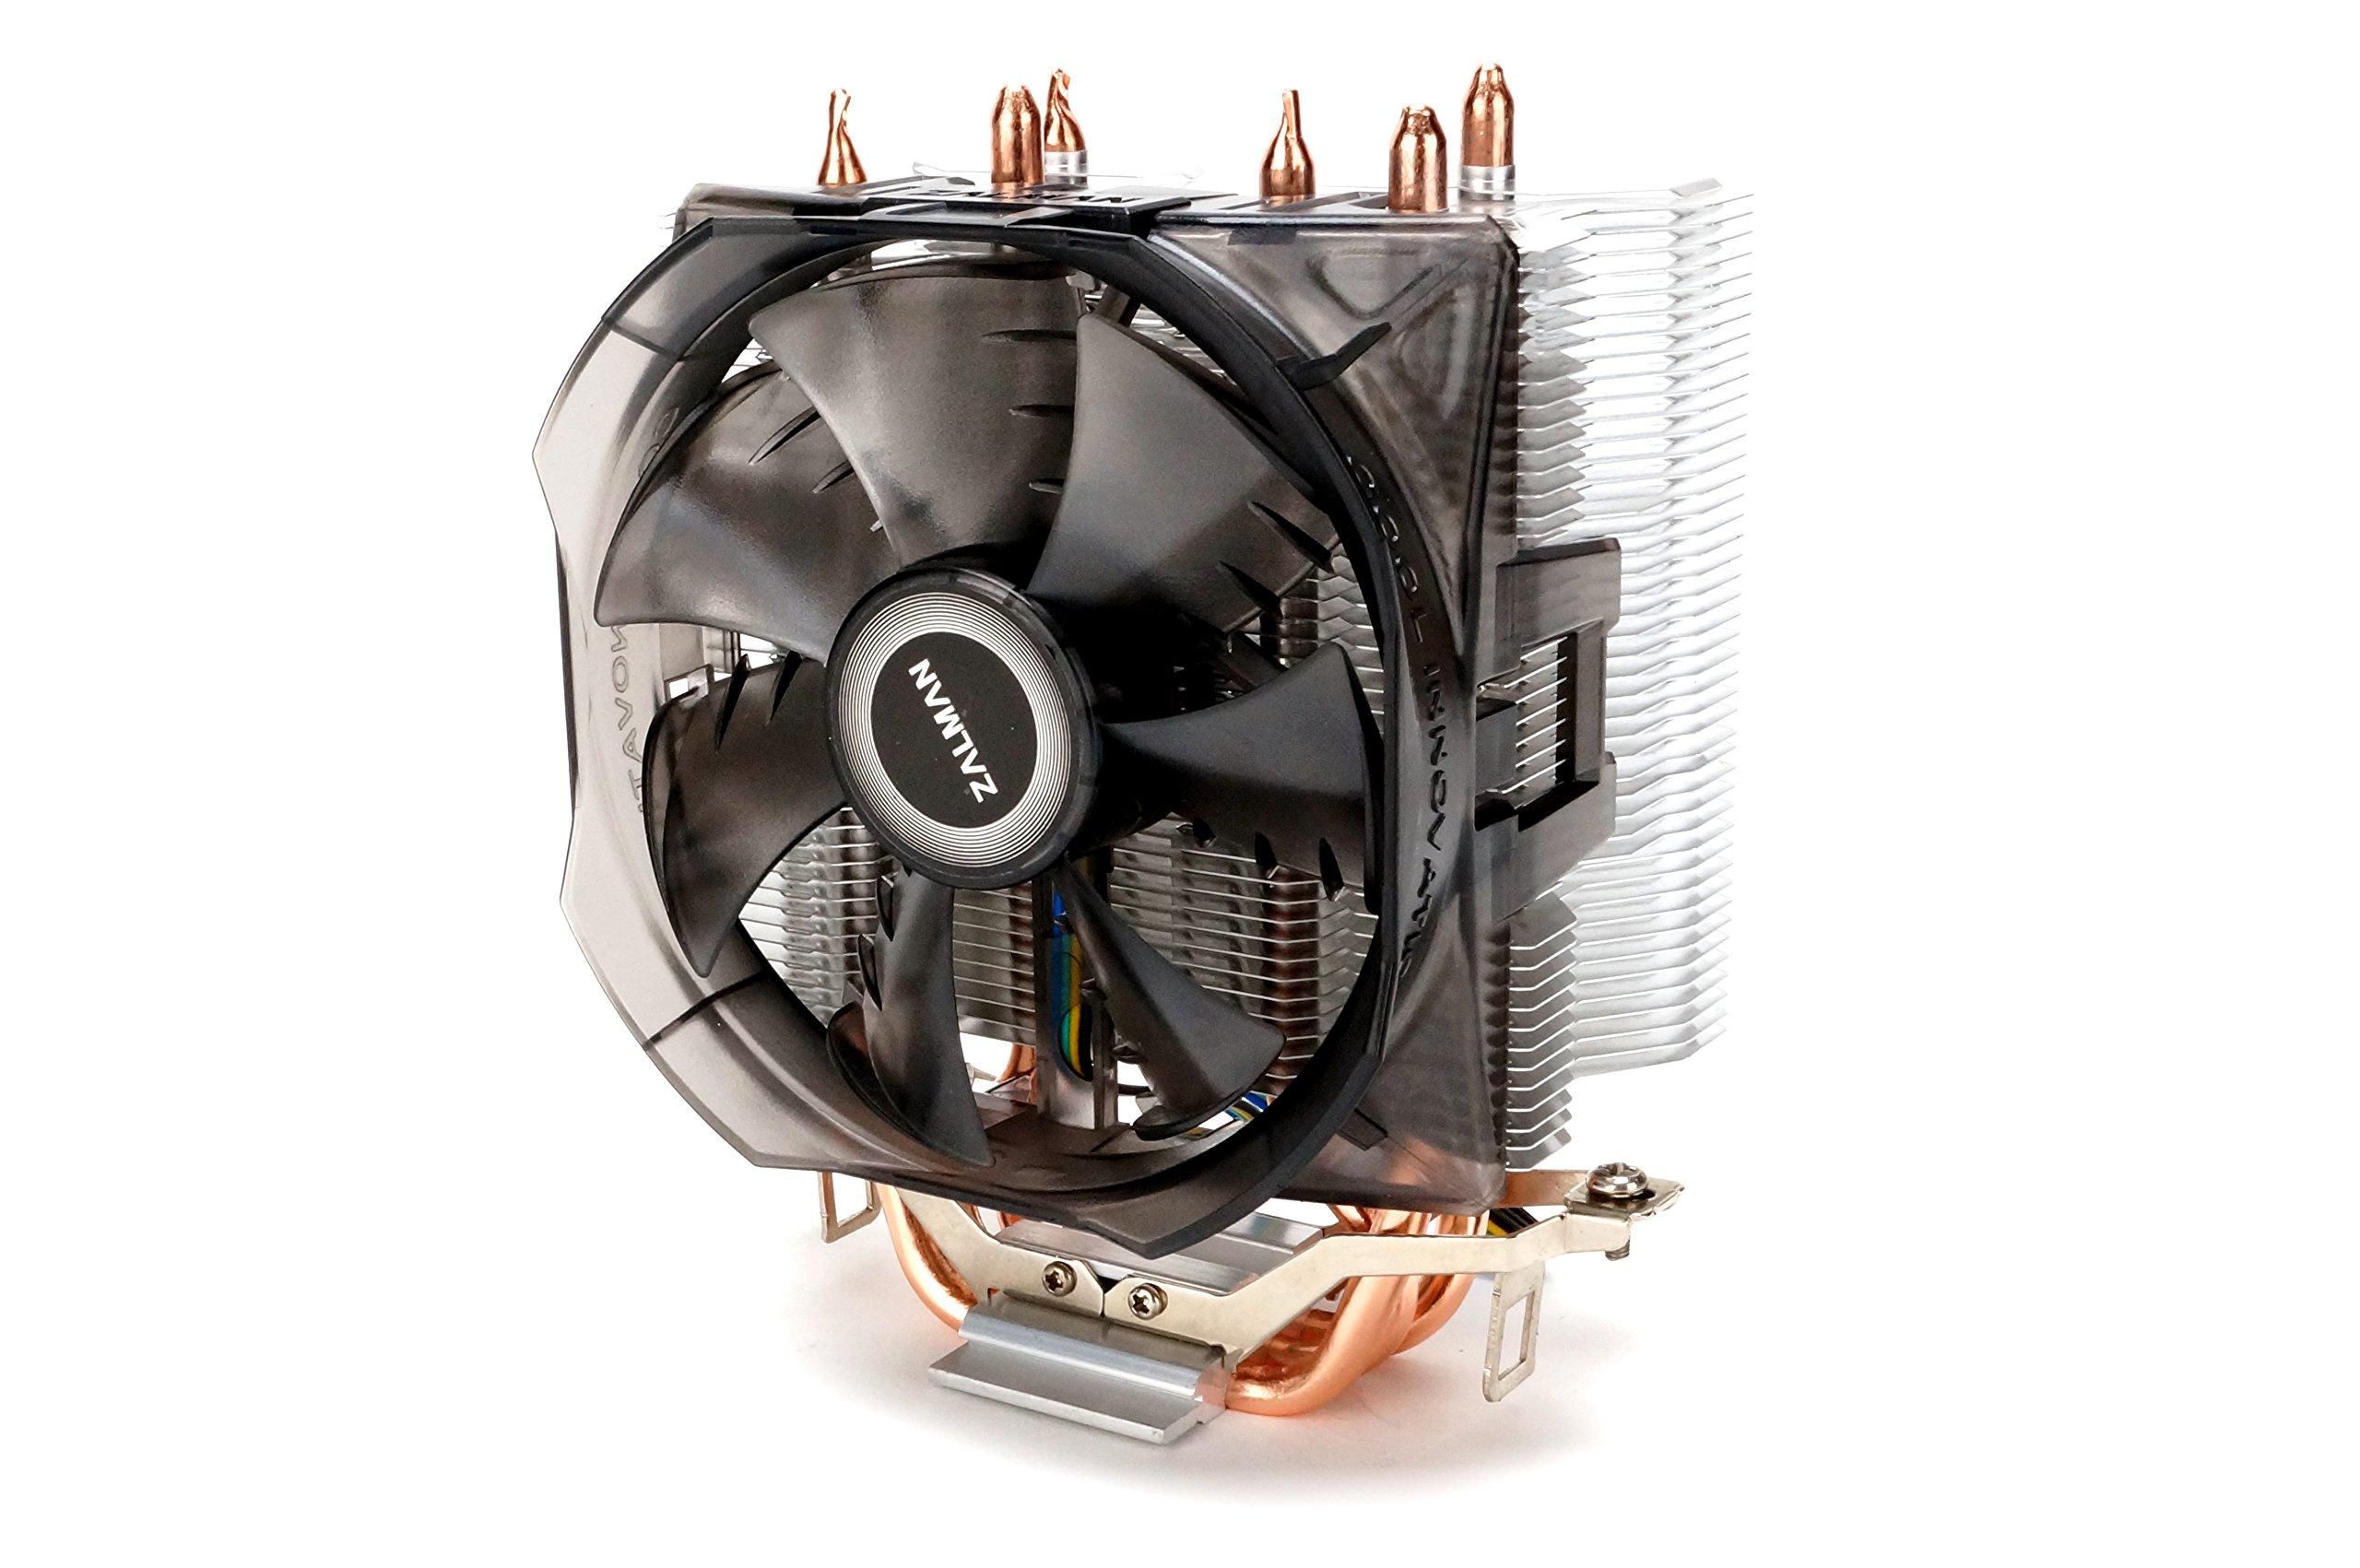 Zalman CPU Cooler with Direct Tough Heatpipe Base and Shark Fin Fan Cooling, Silver, (CNPS8X Optima) by Zalman (Image #1)